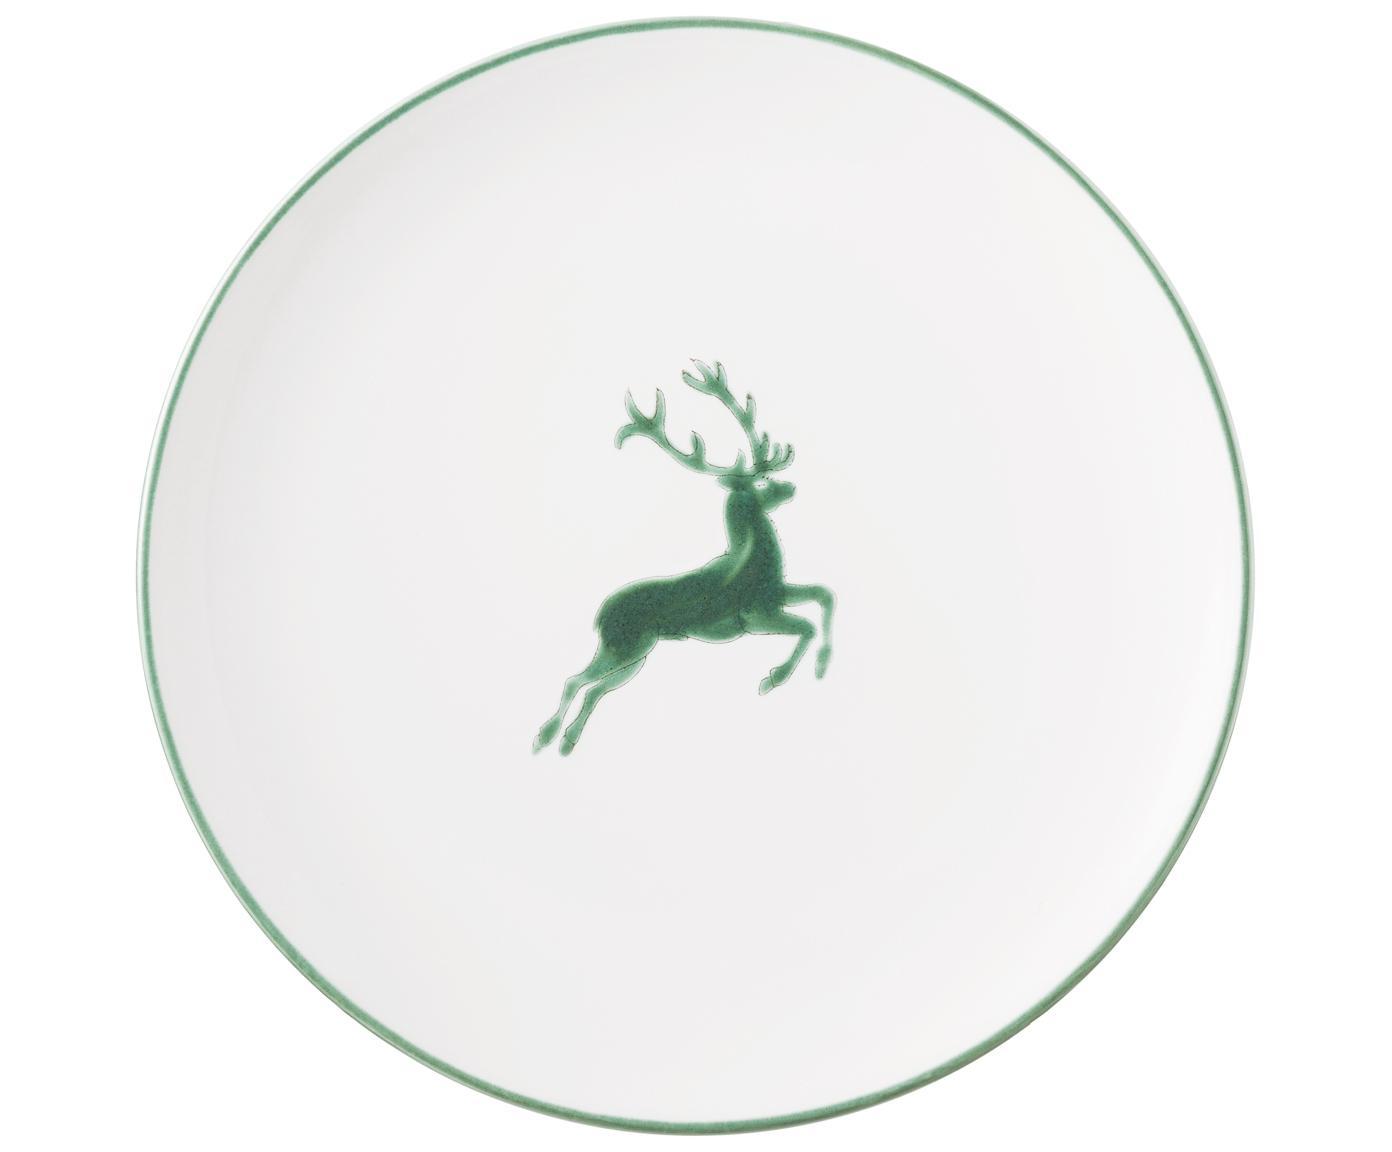 Dinerbord Classic Groene Hert, Keramiek, Wit, Ø 25 cm